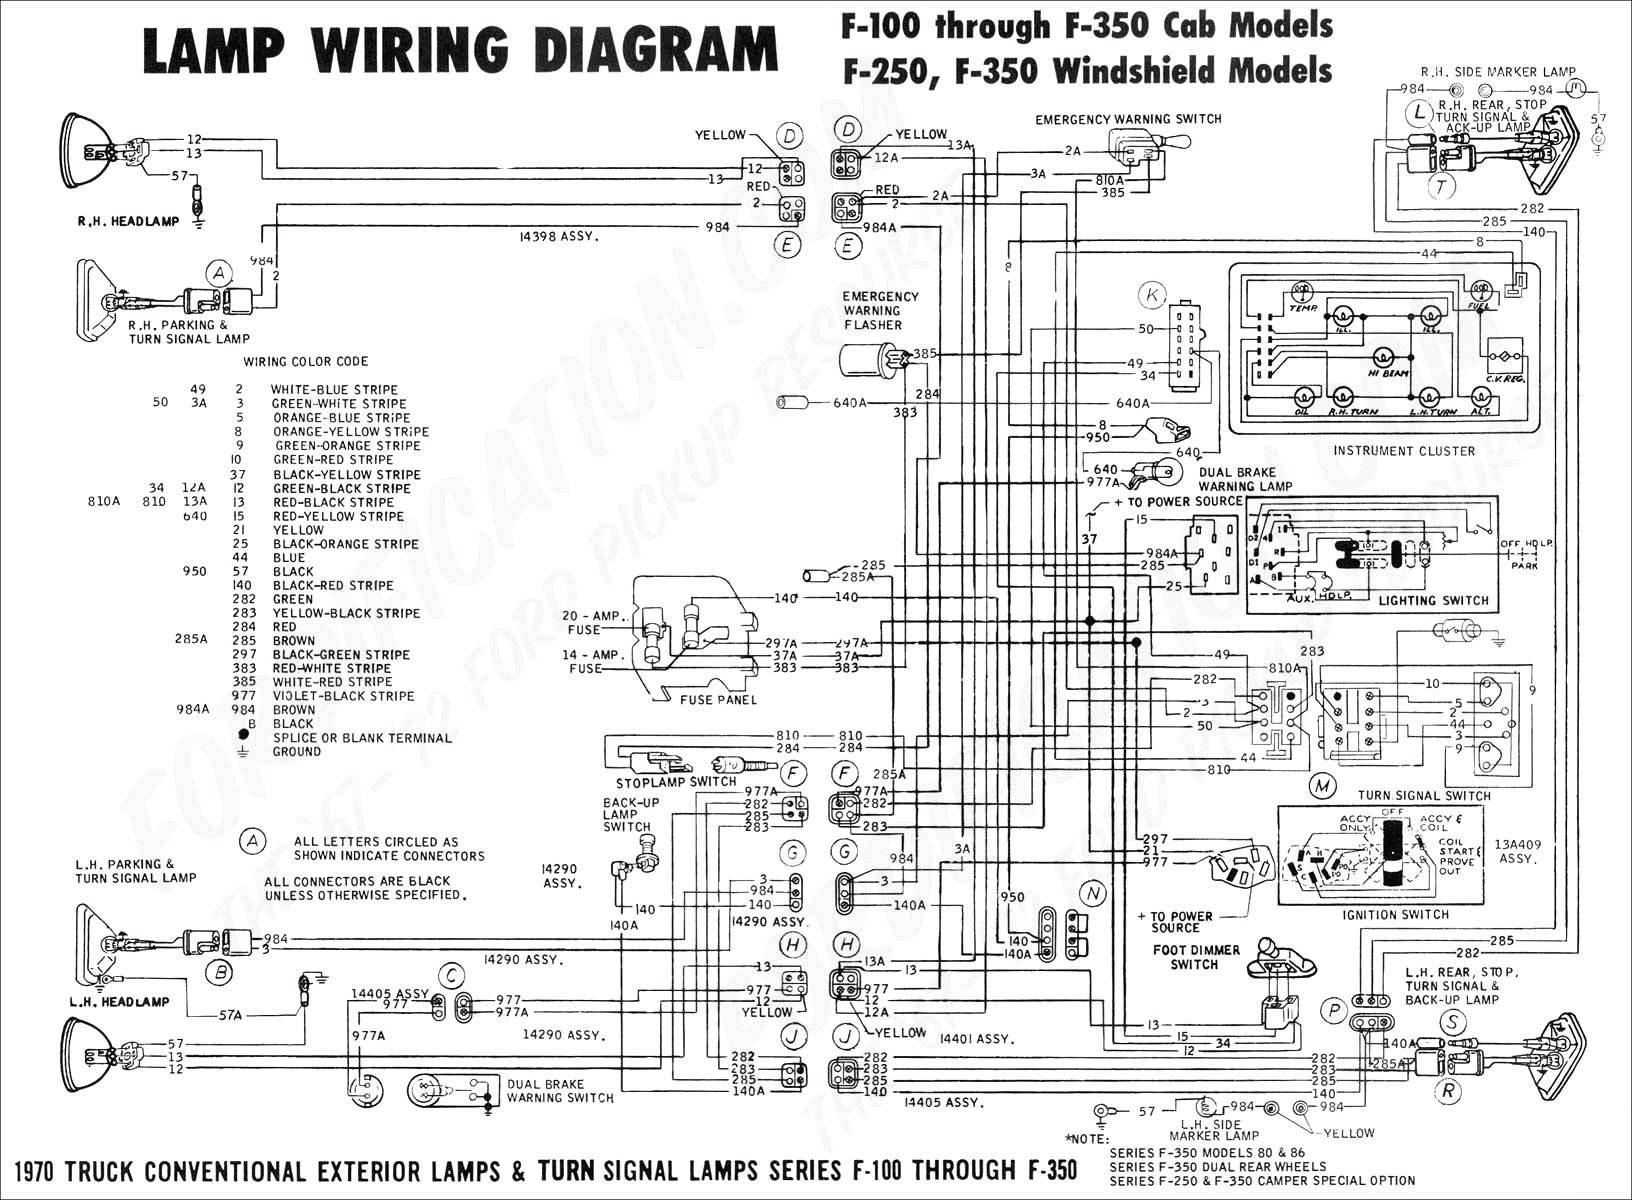 12v Switch Panel Wiring Diagram Amazon Iztor Waterproof 4 ... on